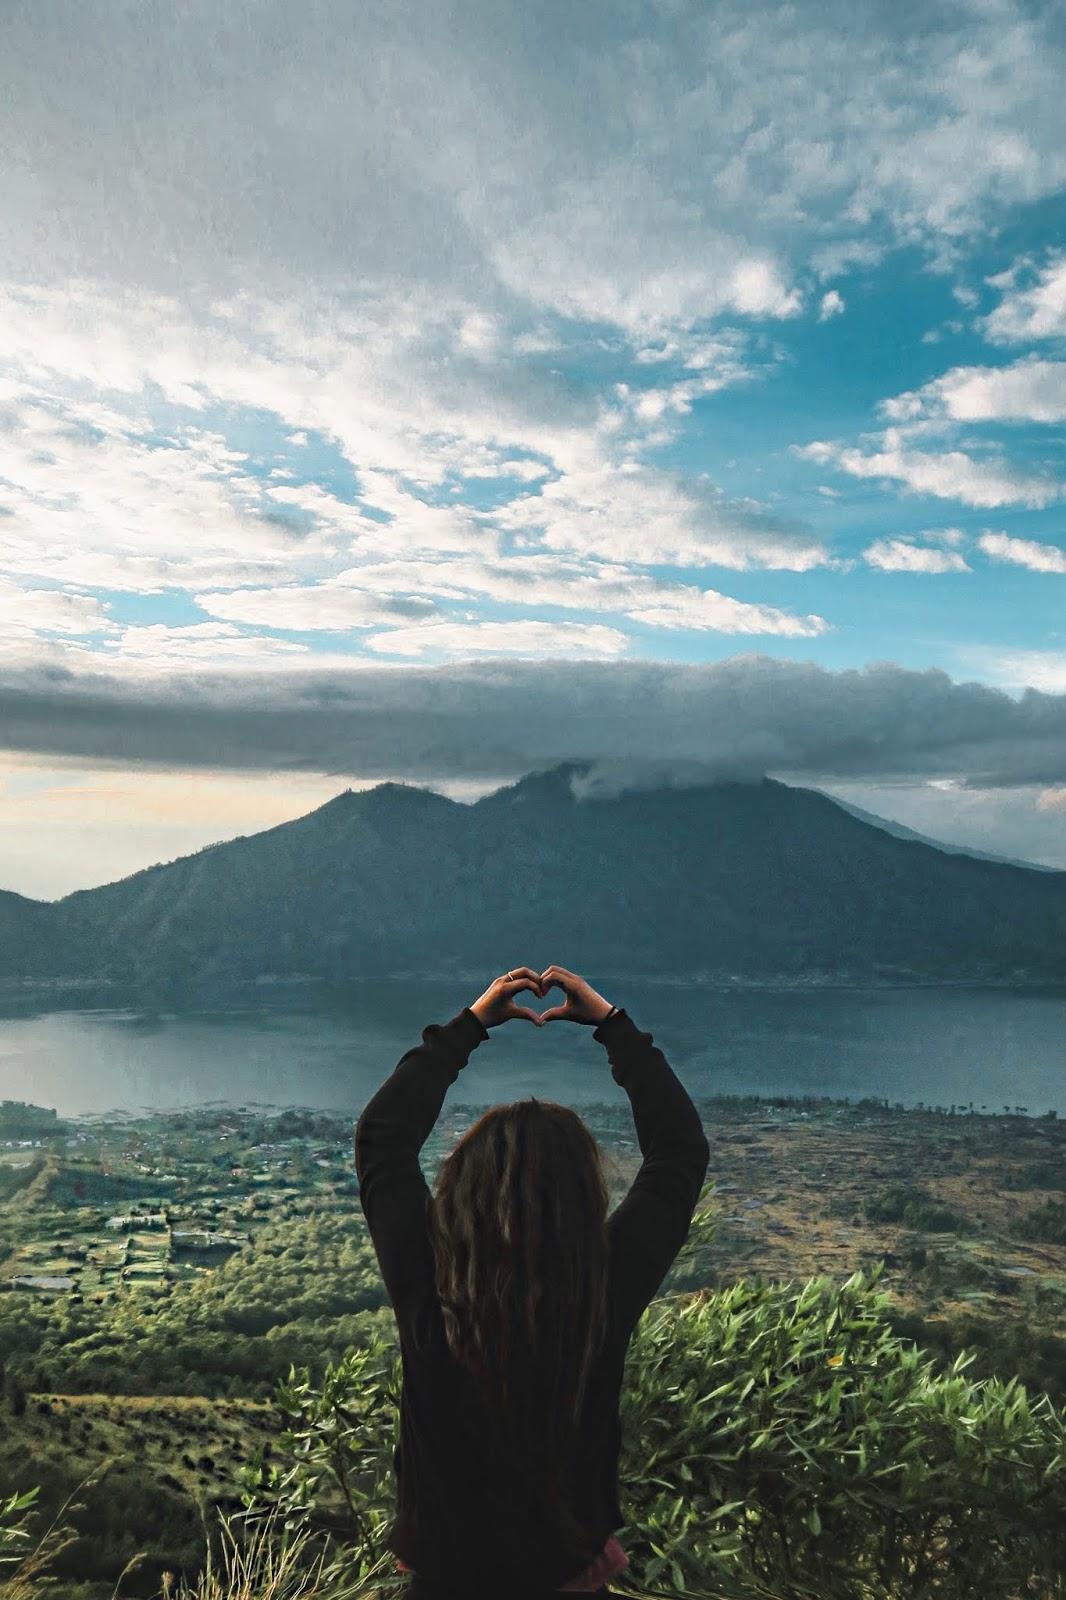 WanderlustBeautyDreams, Mount Batur Bali Indonesia